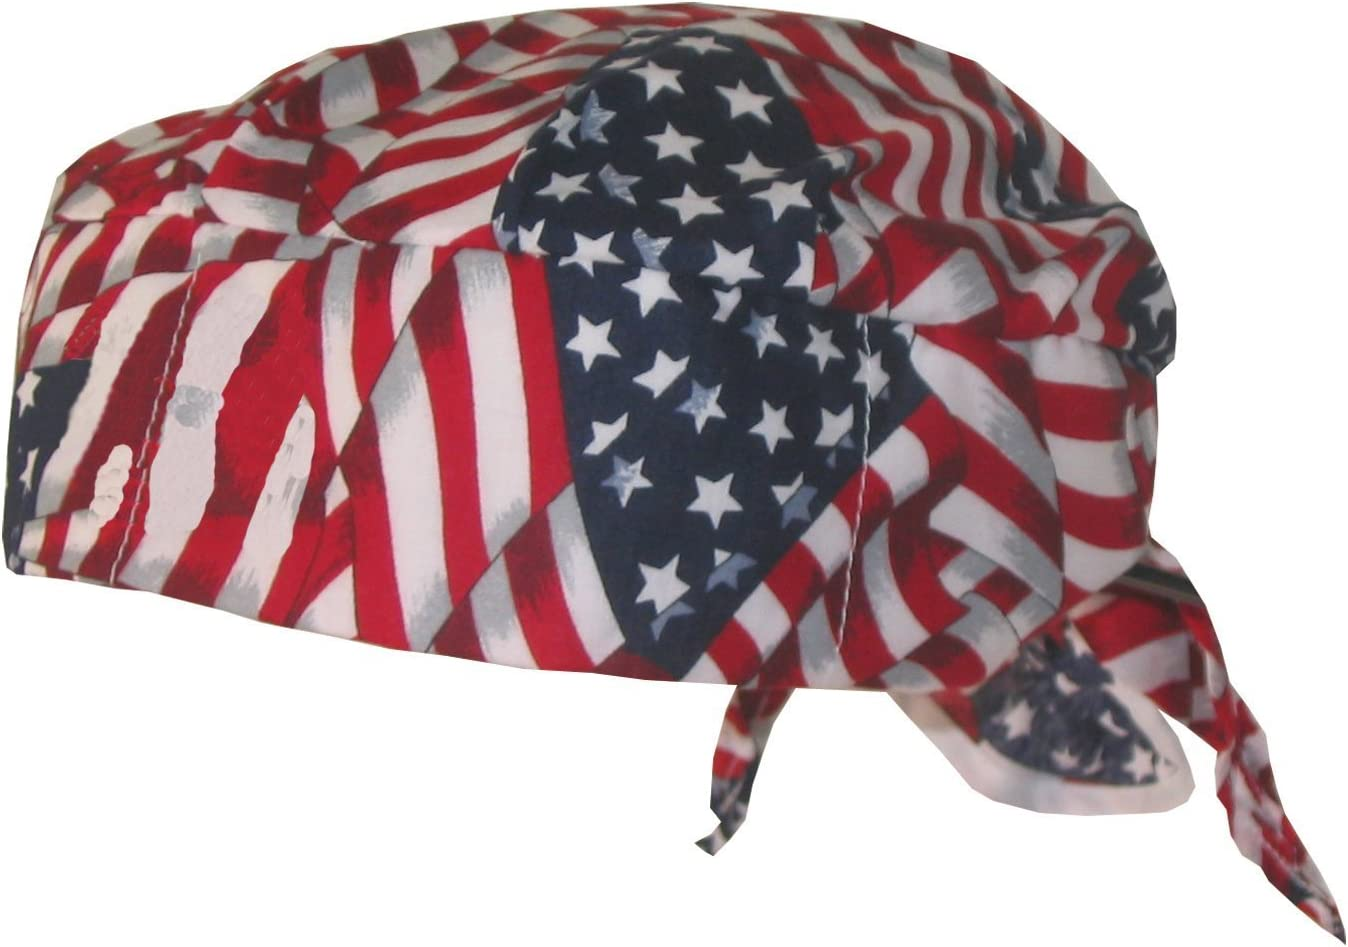 Tools & Harware HyperKewl 6536-USA Evaporative Cooling Skull Cap, Model: 6536-USA